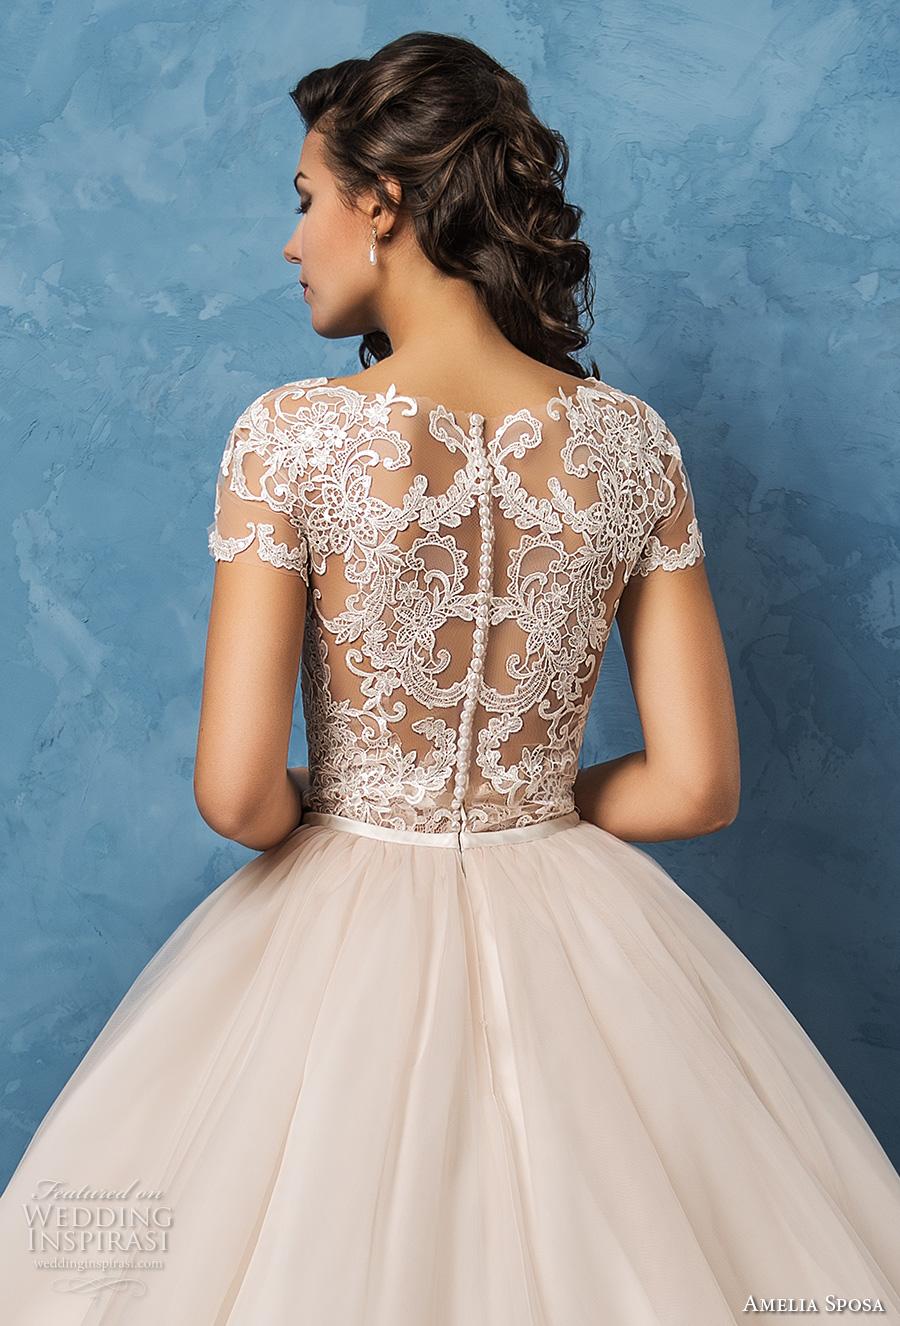 amelia sposa 2017 bridal lace short sleeves sheer bateau sweetheart neckline heavily embellished bodice romantic princess ball gown wedding dress lace back royal train (regina) zbv